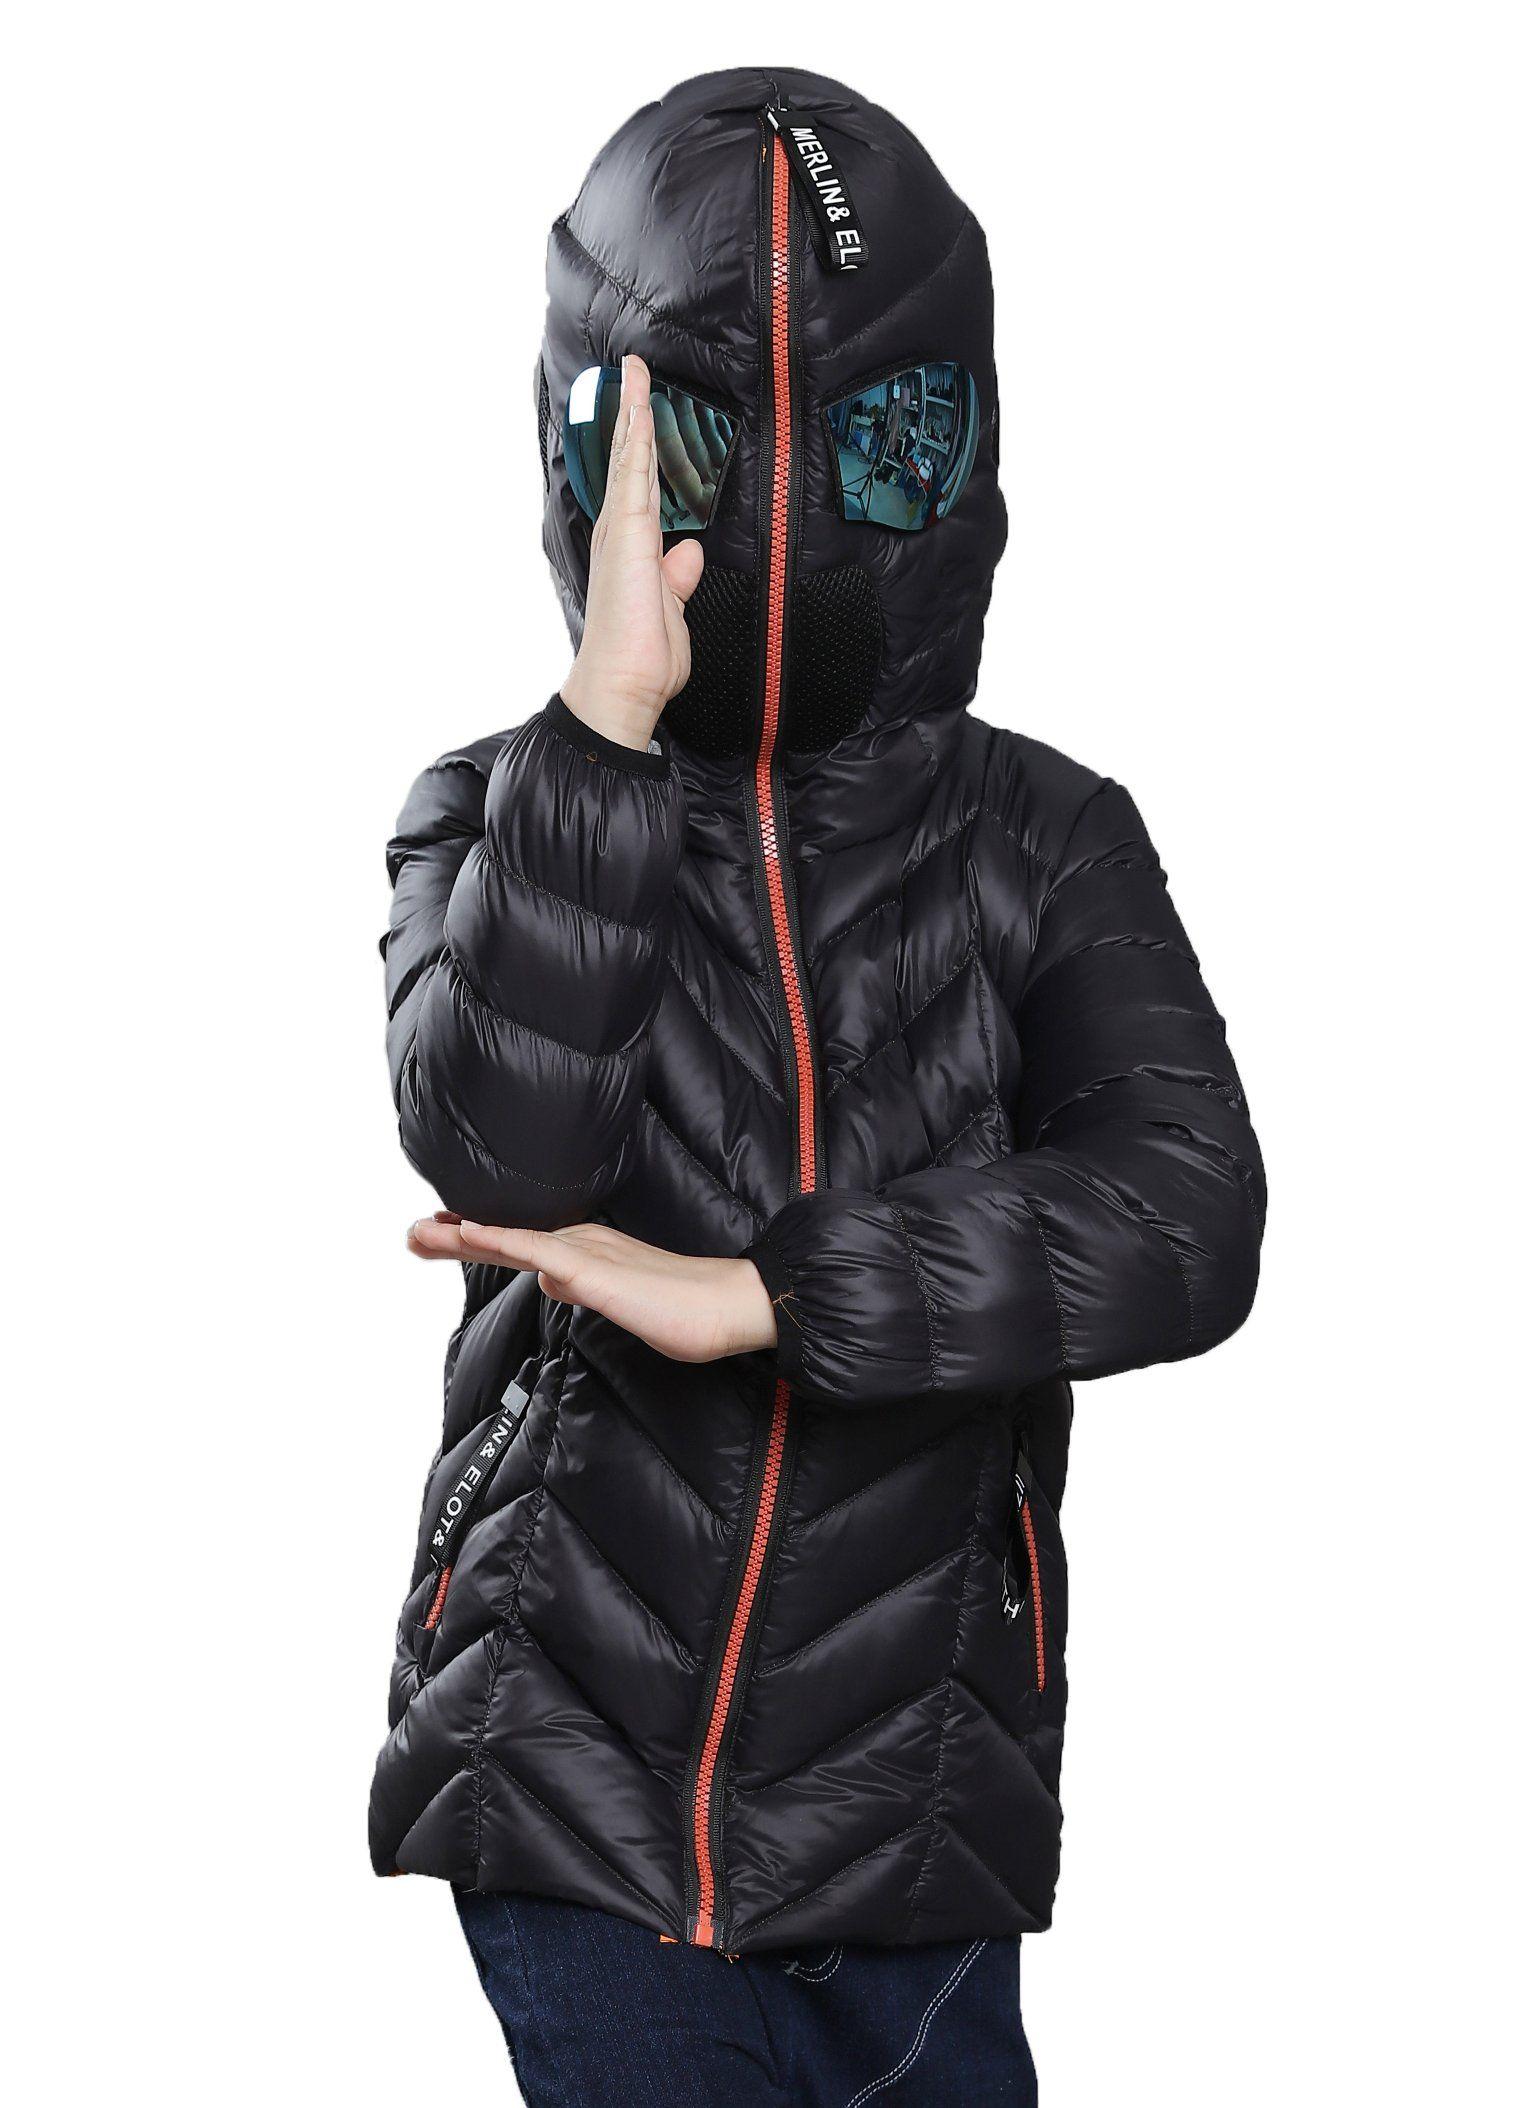 9af5a8f9fb39 Eumerce Ultraman Kids Boys Girls Winter Pullover Outerwear With ...